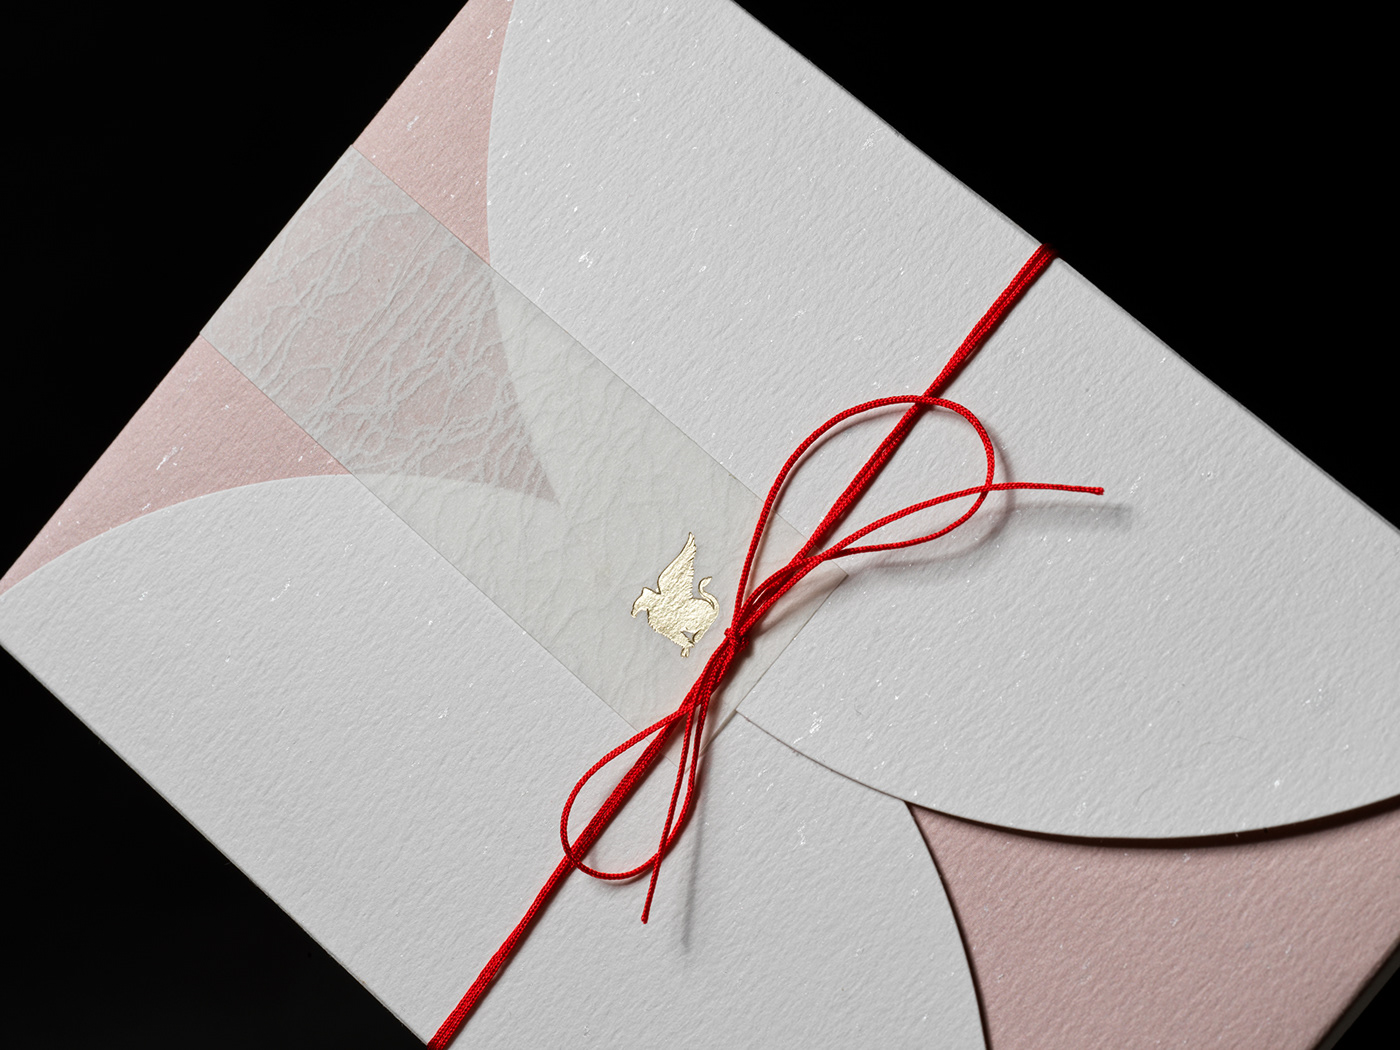 foil hotel Invitation japanese Marriott oddity Packaging print effect